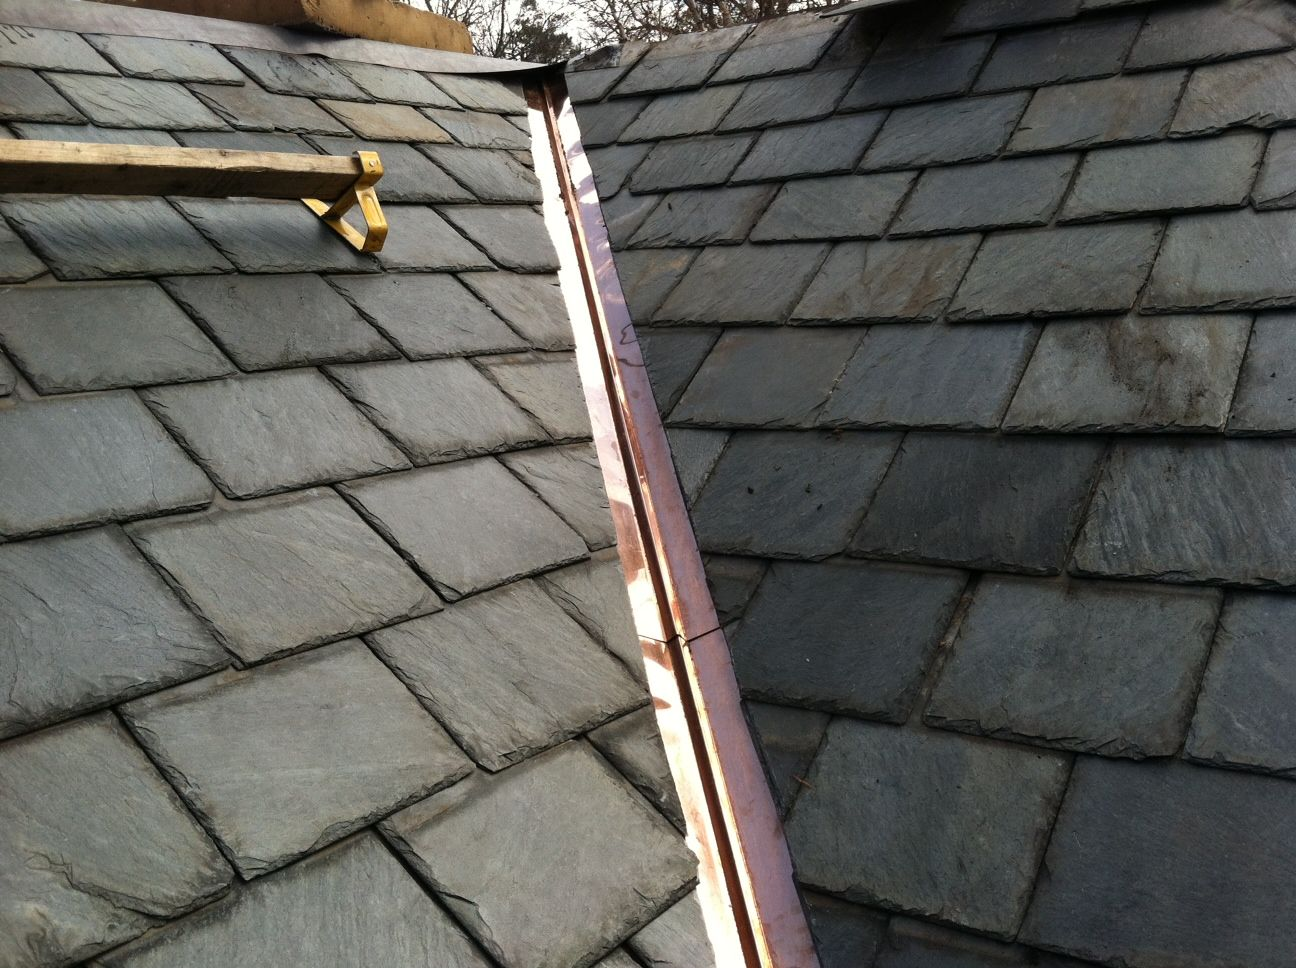 Copper Valley Replacement On Buckingham Slate Roof Www Charlotteroofing Com Slate Roof Roofing Specialists Door Handles